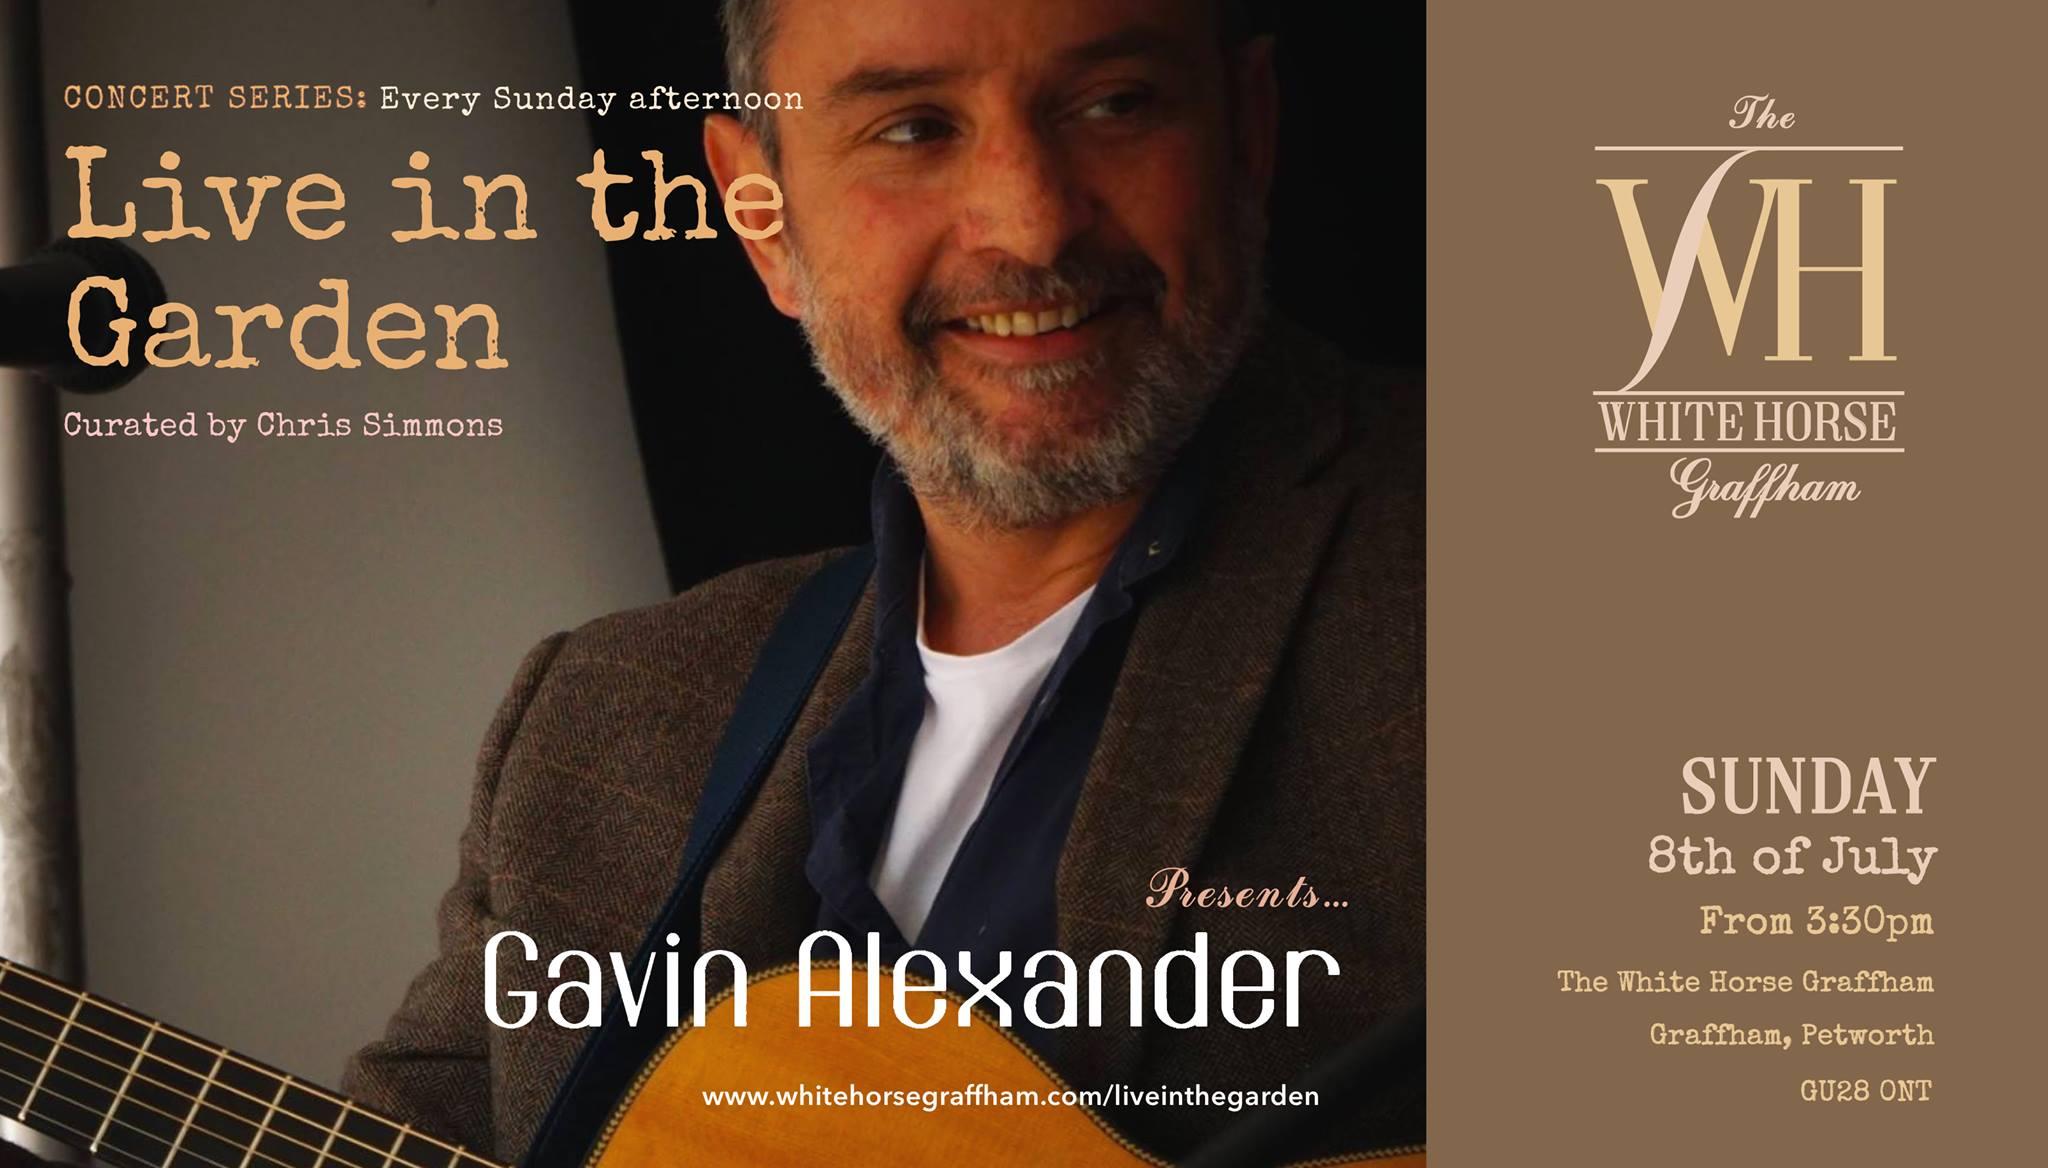 Live in the Garden' presents Gavin Alexander